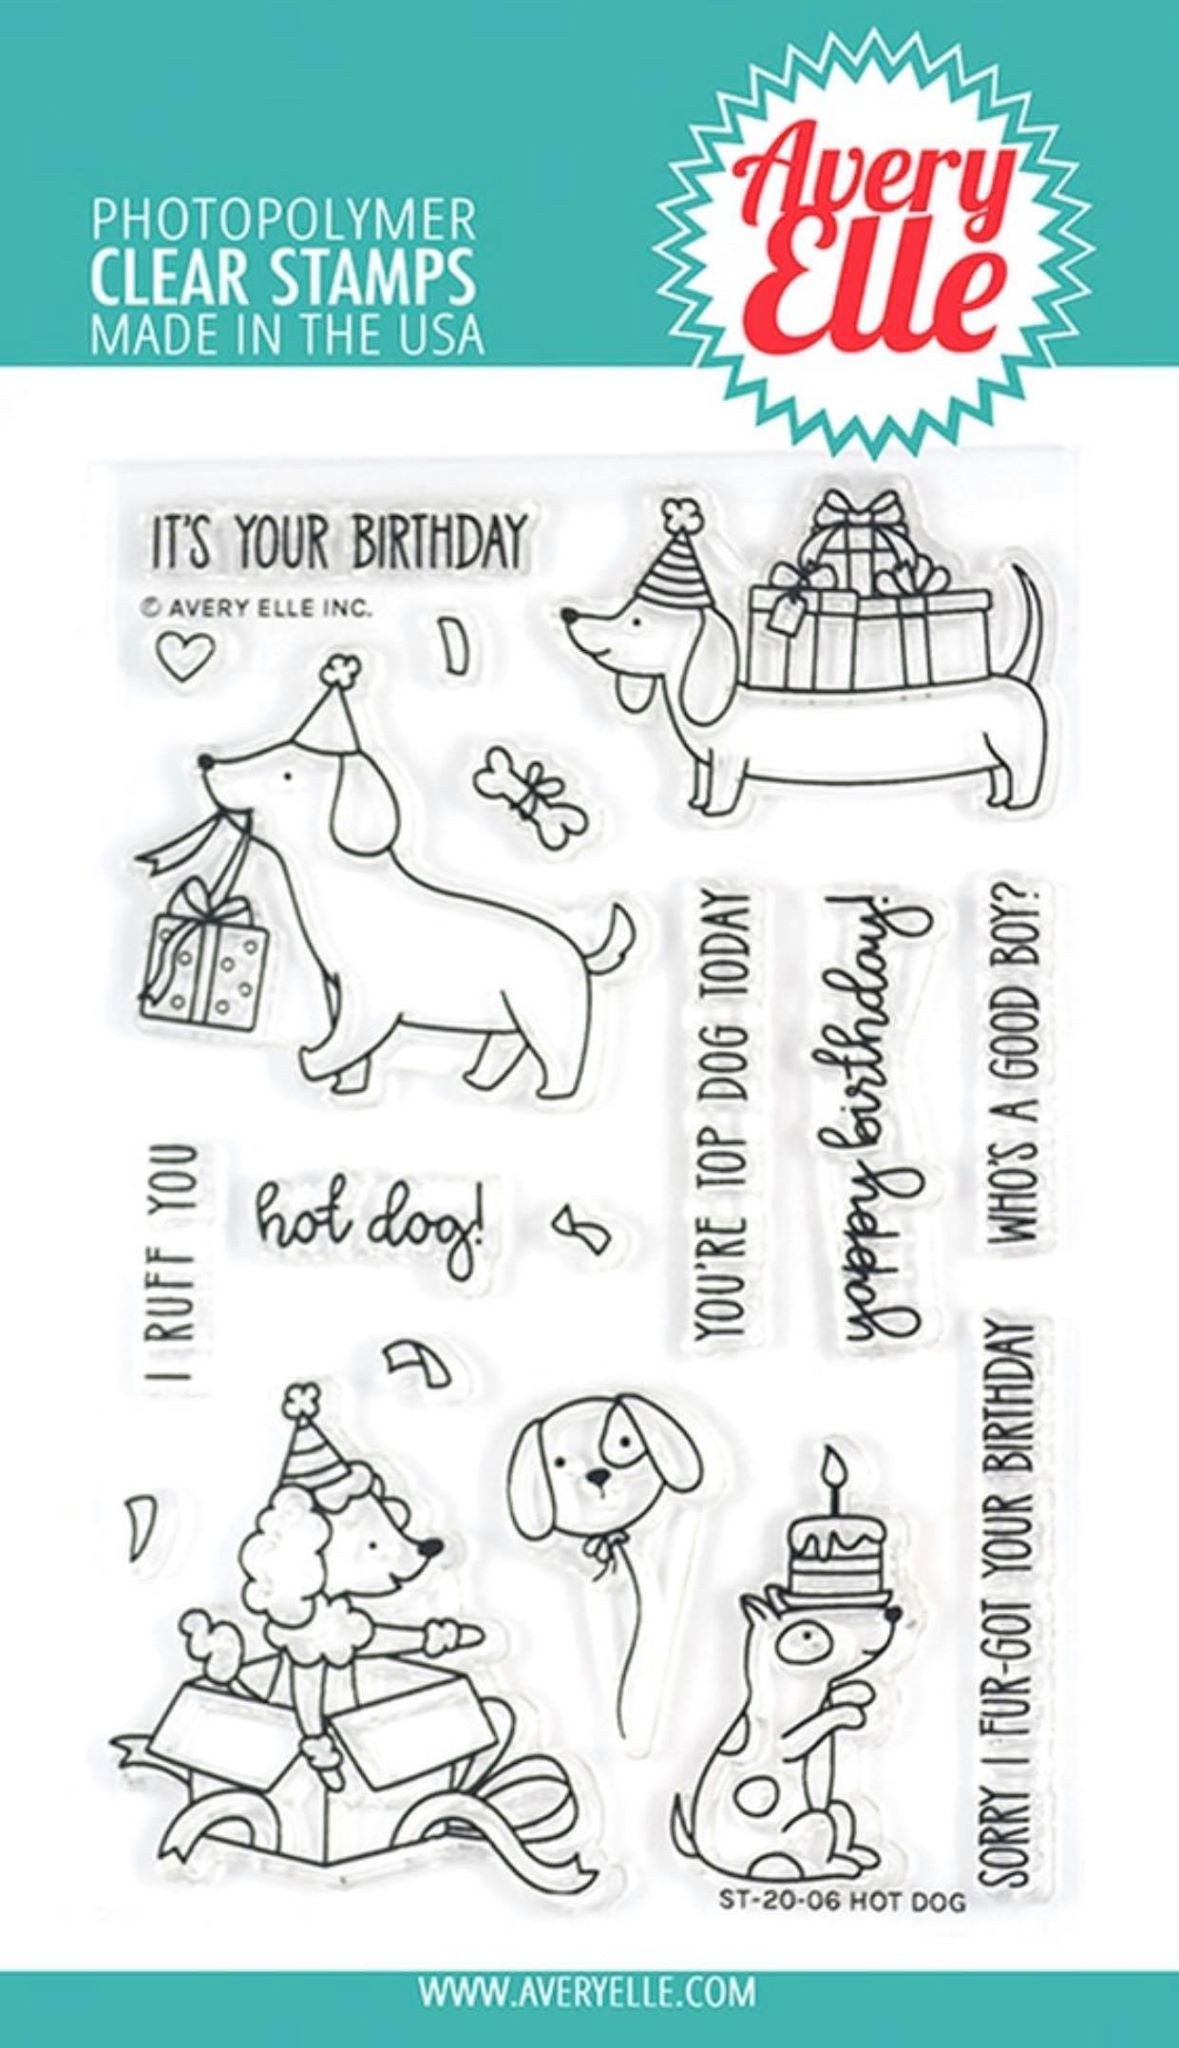 Avery Elle - Hot Dog Stamp Set